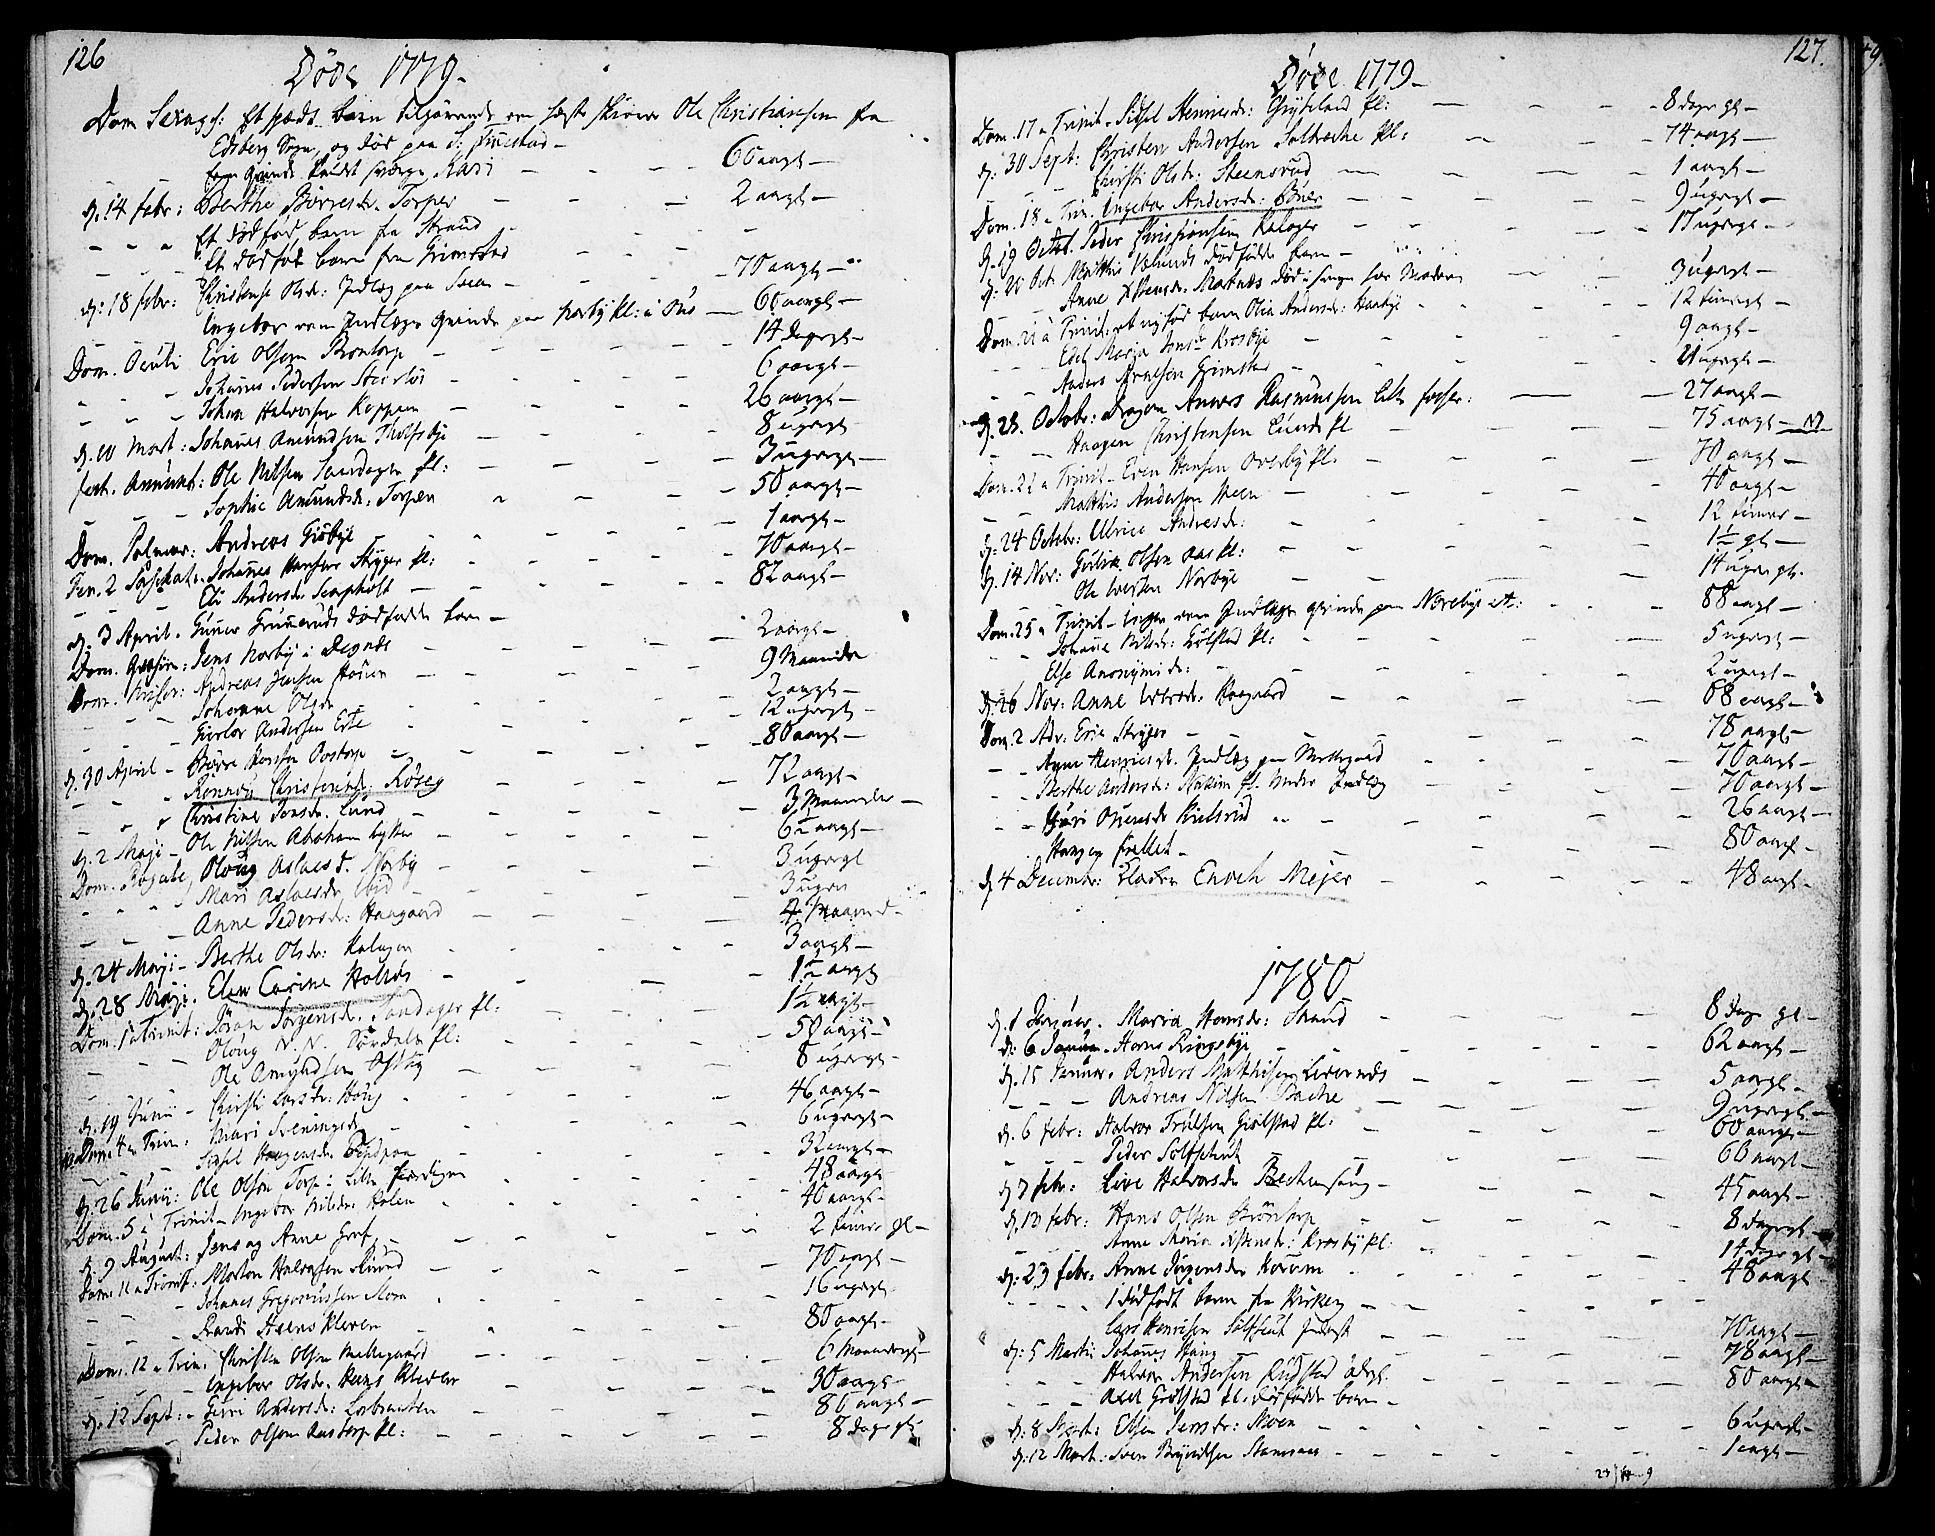 SAO, Rakkestad prestekontor Kirkebøker, F/Fa/L0004: Ministerialbok nr. I 4, 1777-1783, s. 126-127